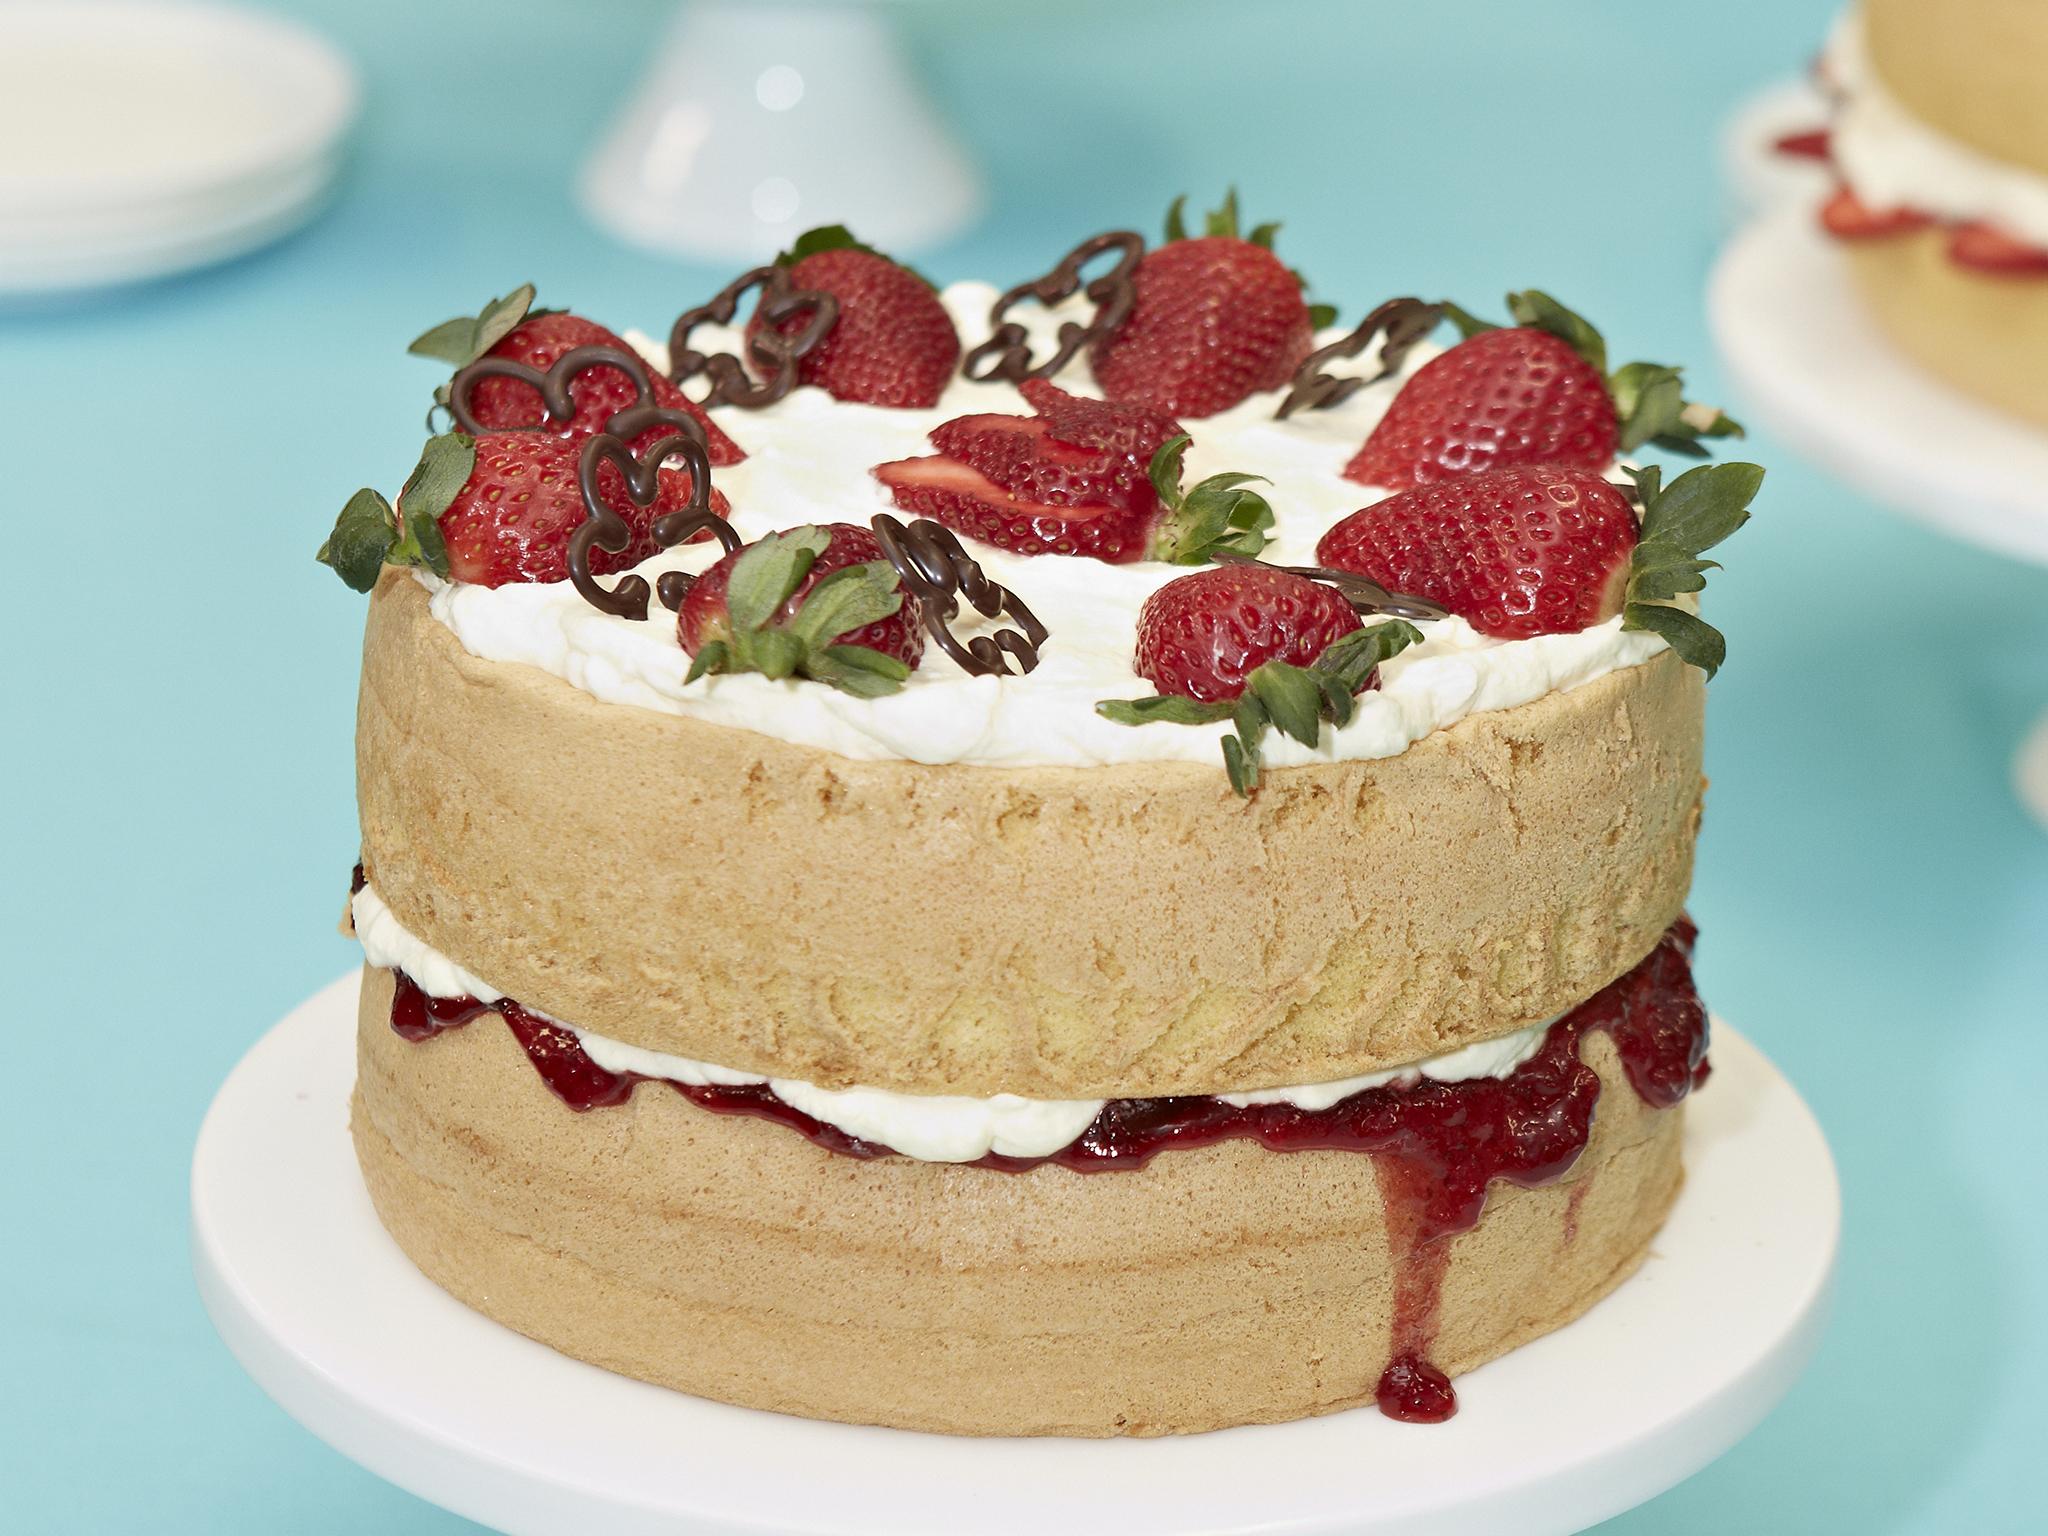 Sponge cake with strawberries